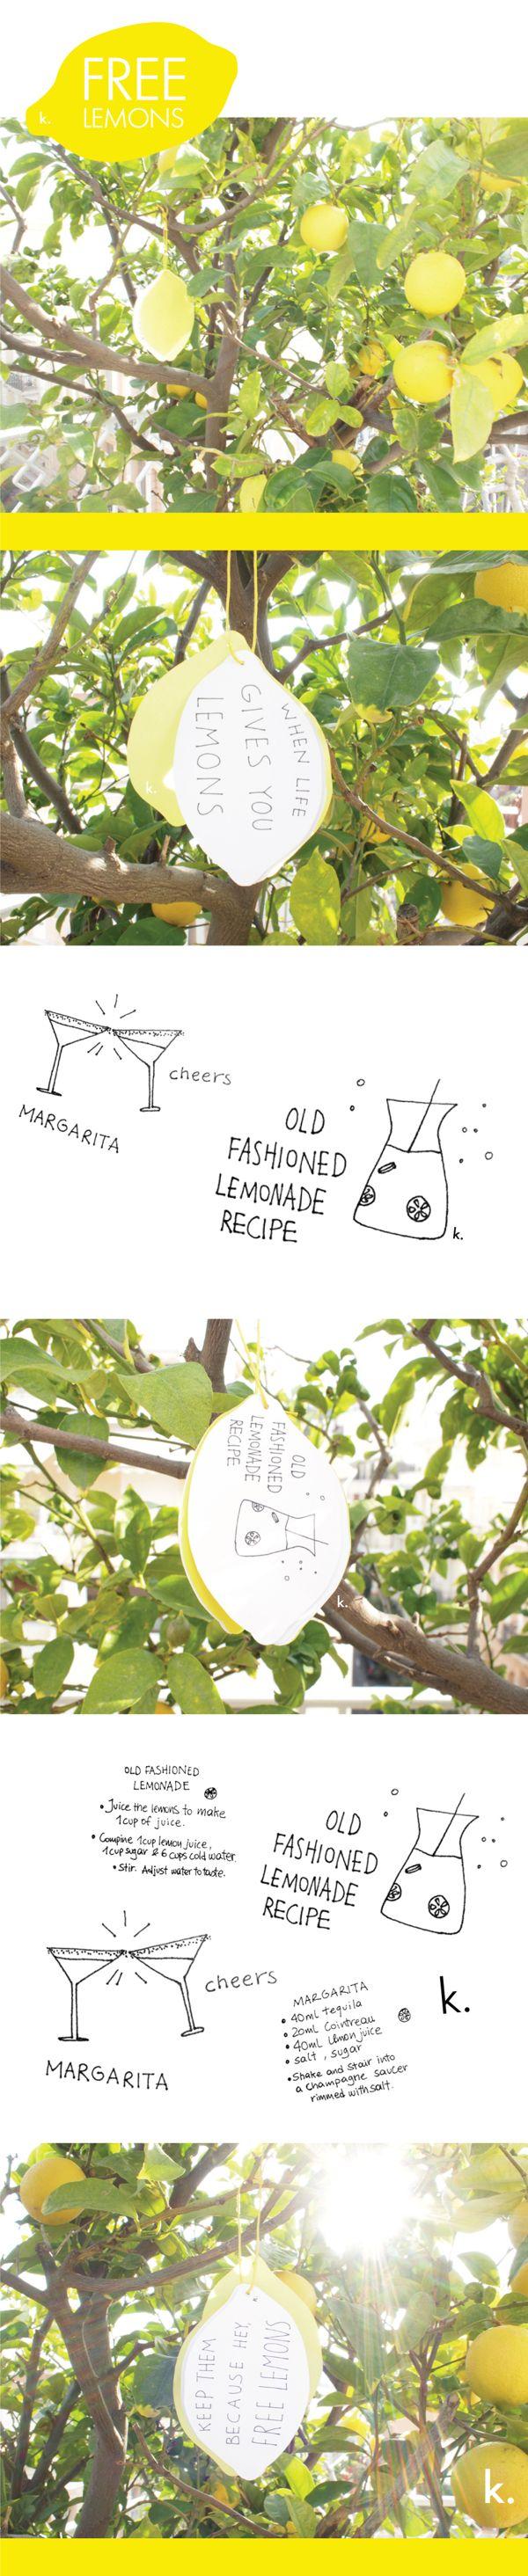 Free Lemons by Katerina Vlachava, via Behance